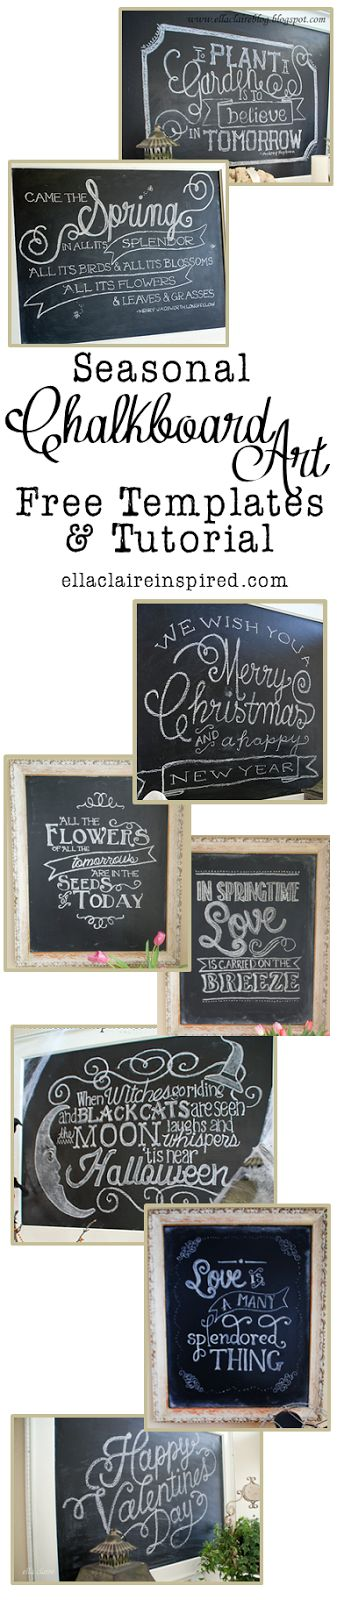 Seasonal Chalkboard Art with Free Templates and Tutorial! #DIY #Chalkboard